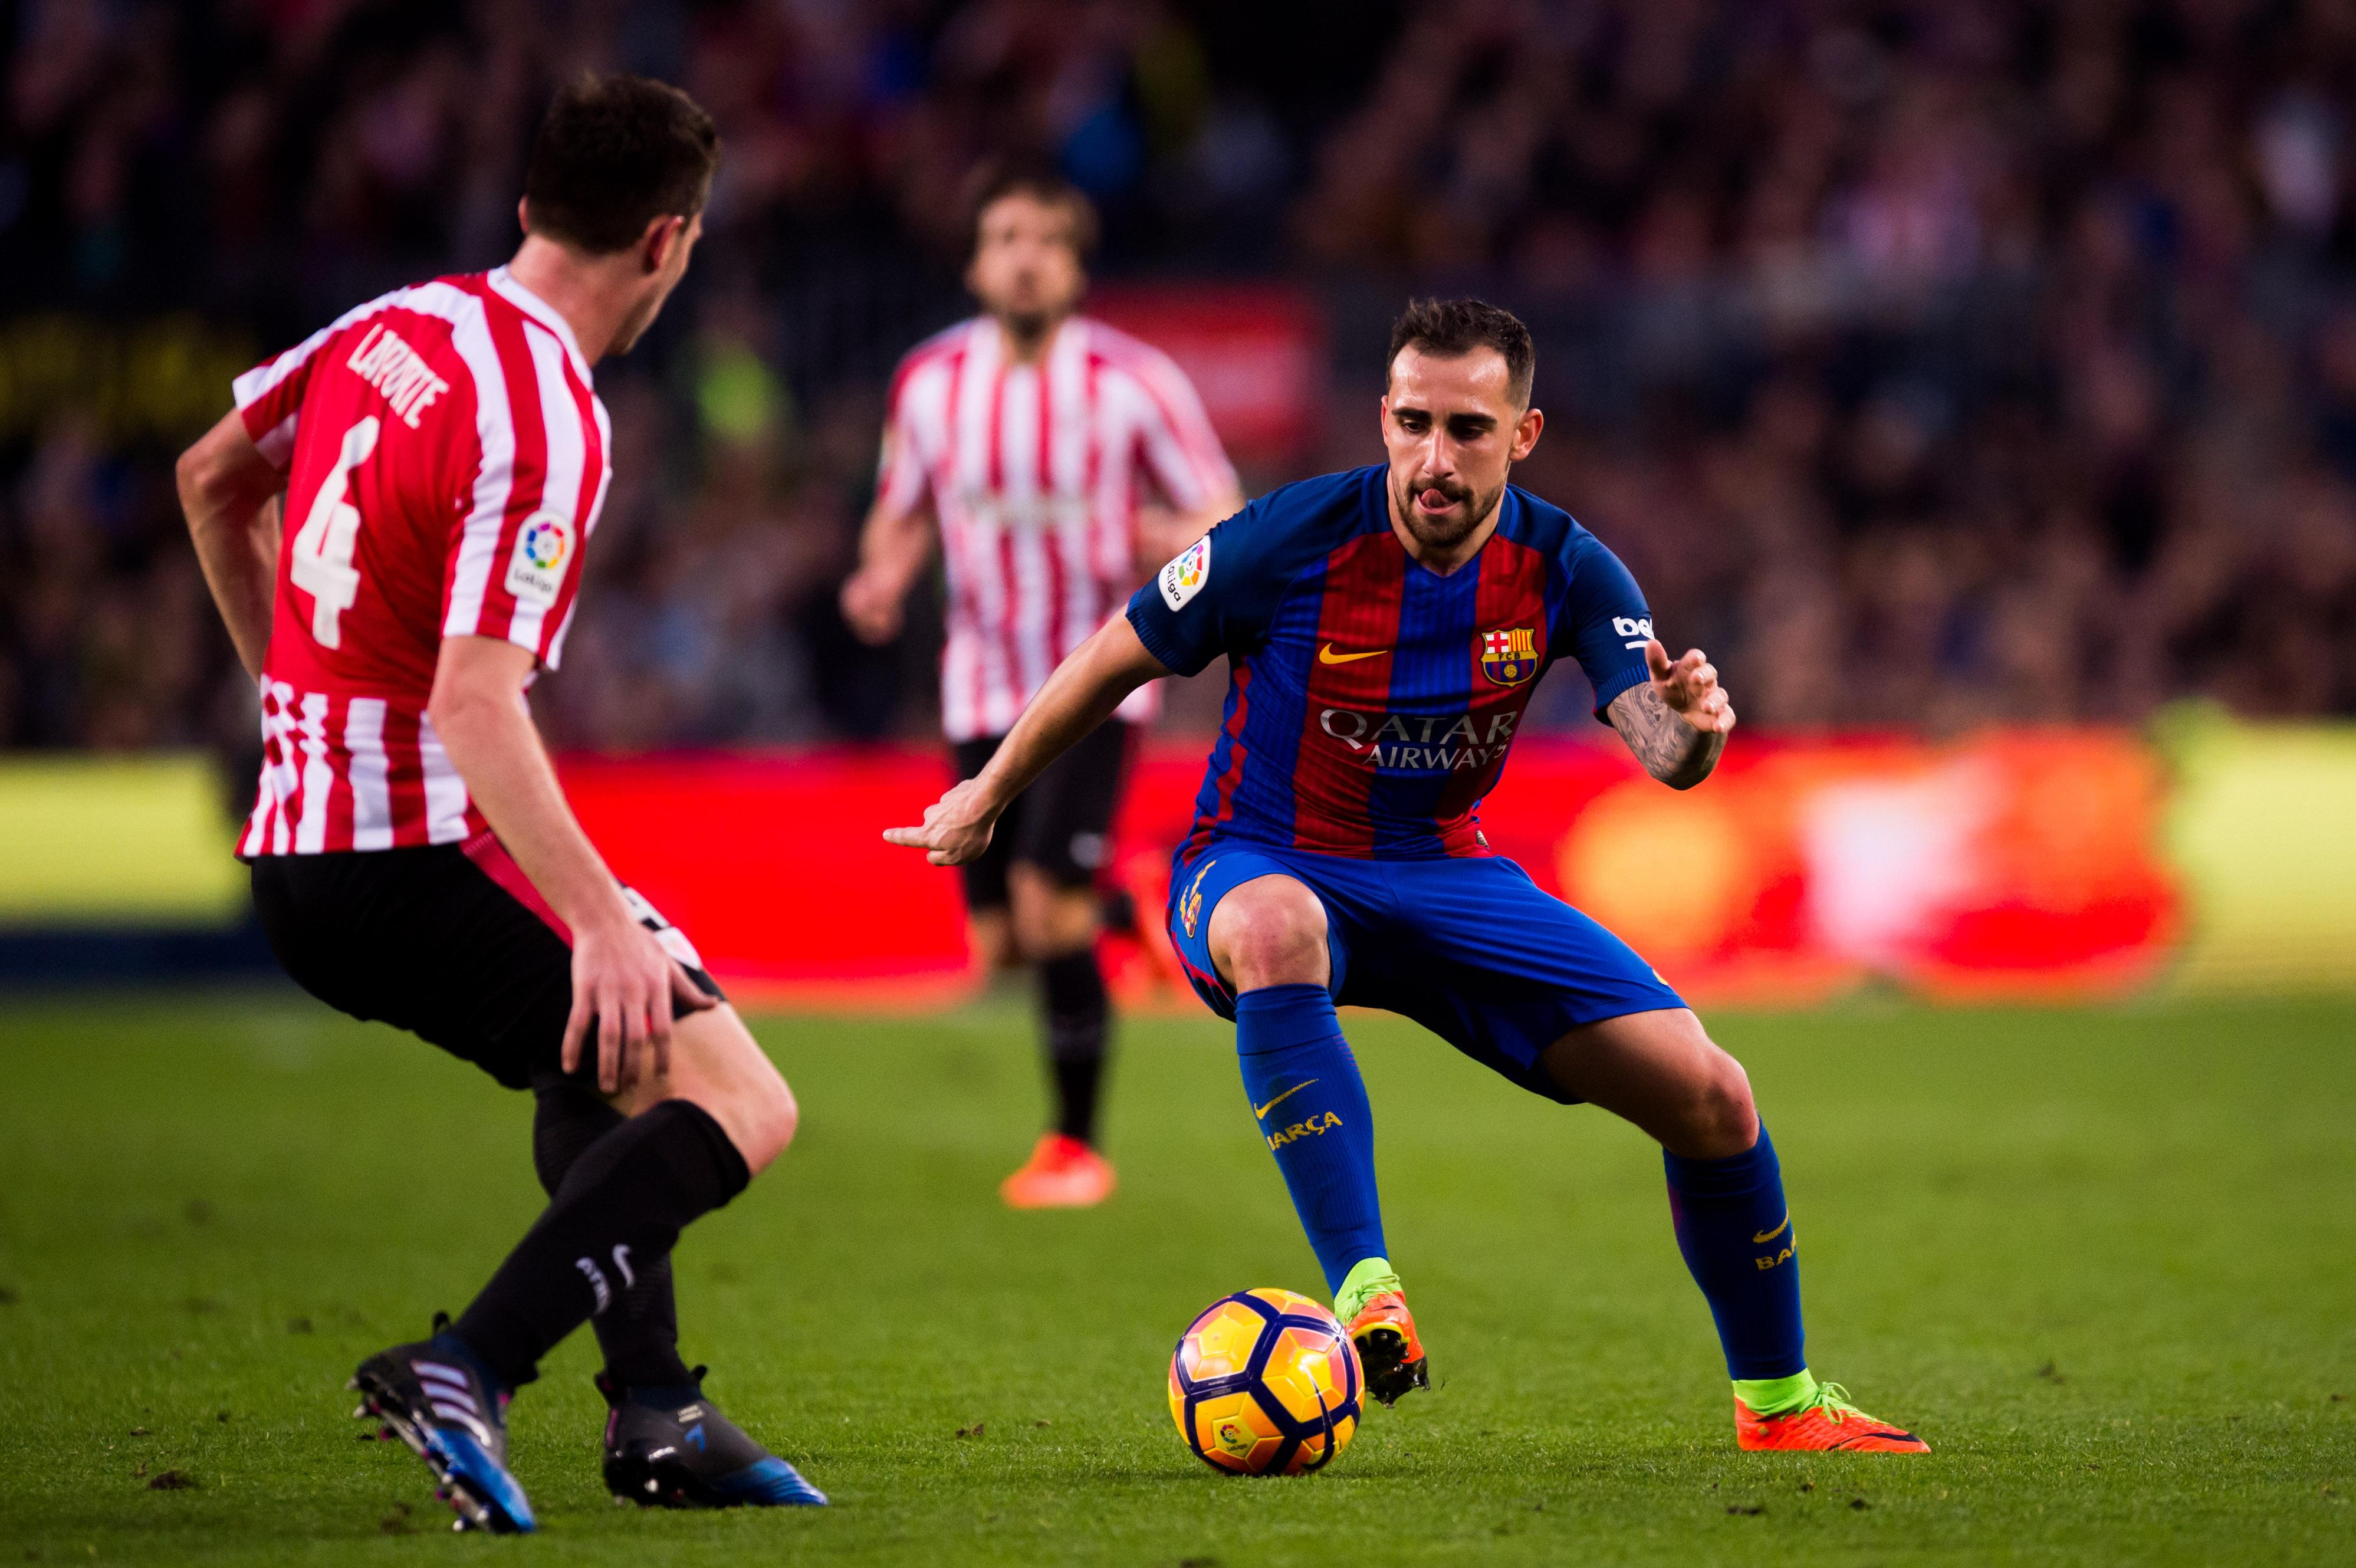 Ath Bilbao Vs Barcelona: Athletic Bilbao Vs Barcelona, 2017 Copa Del Rey: Match